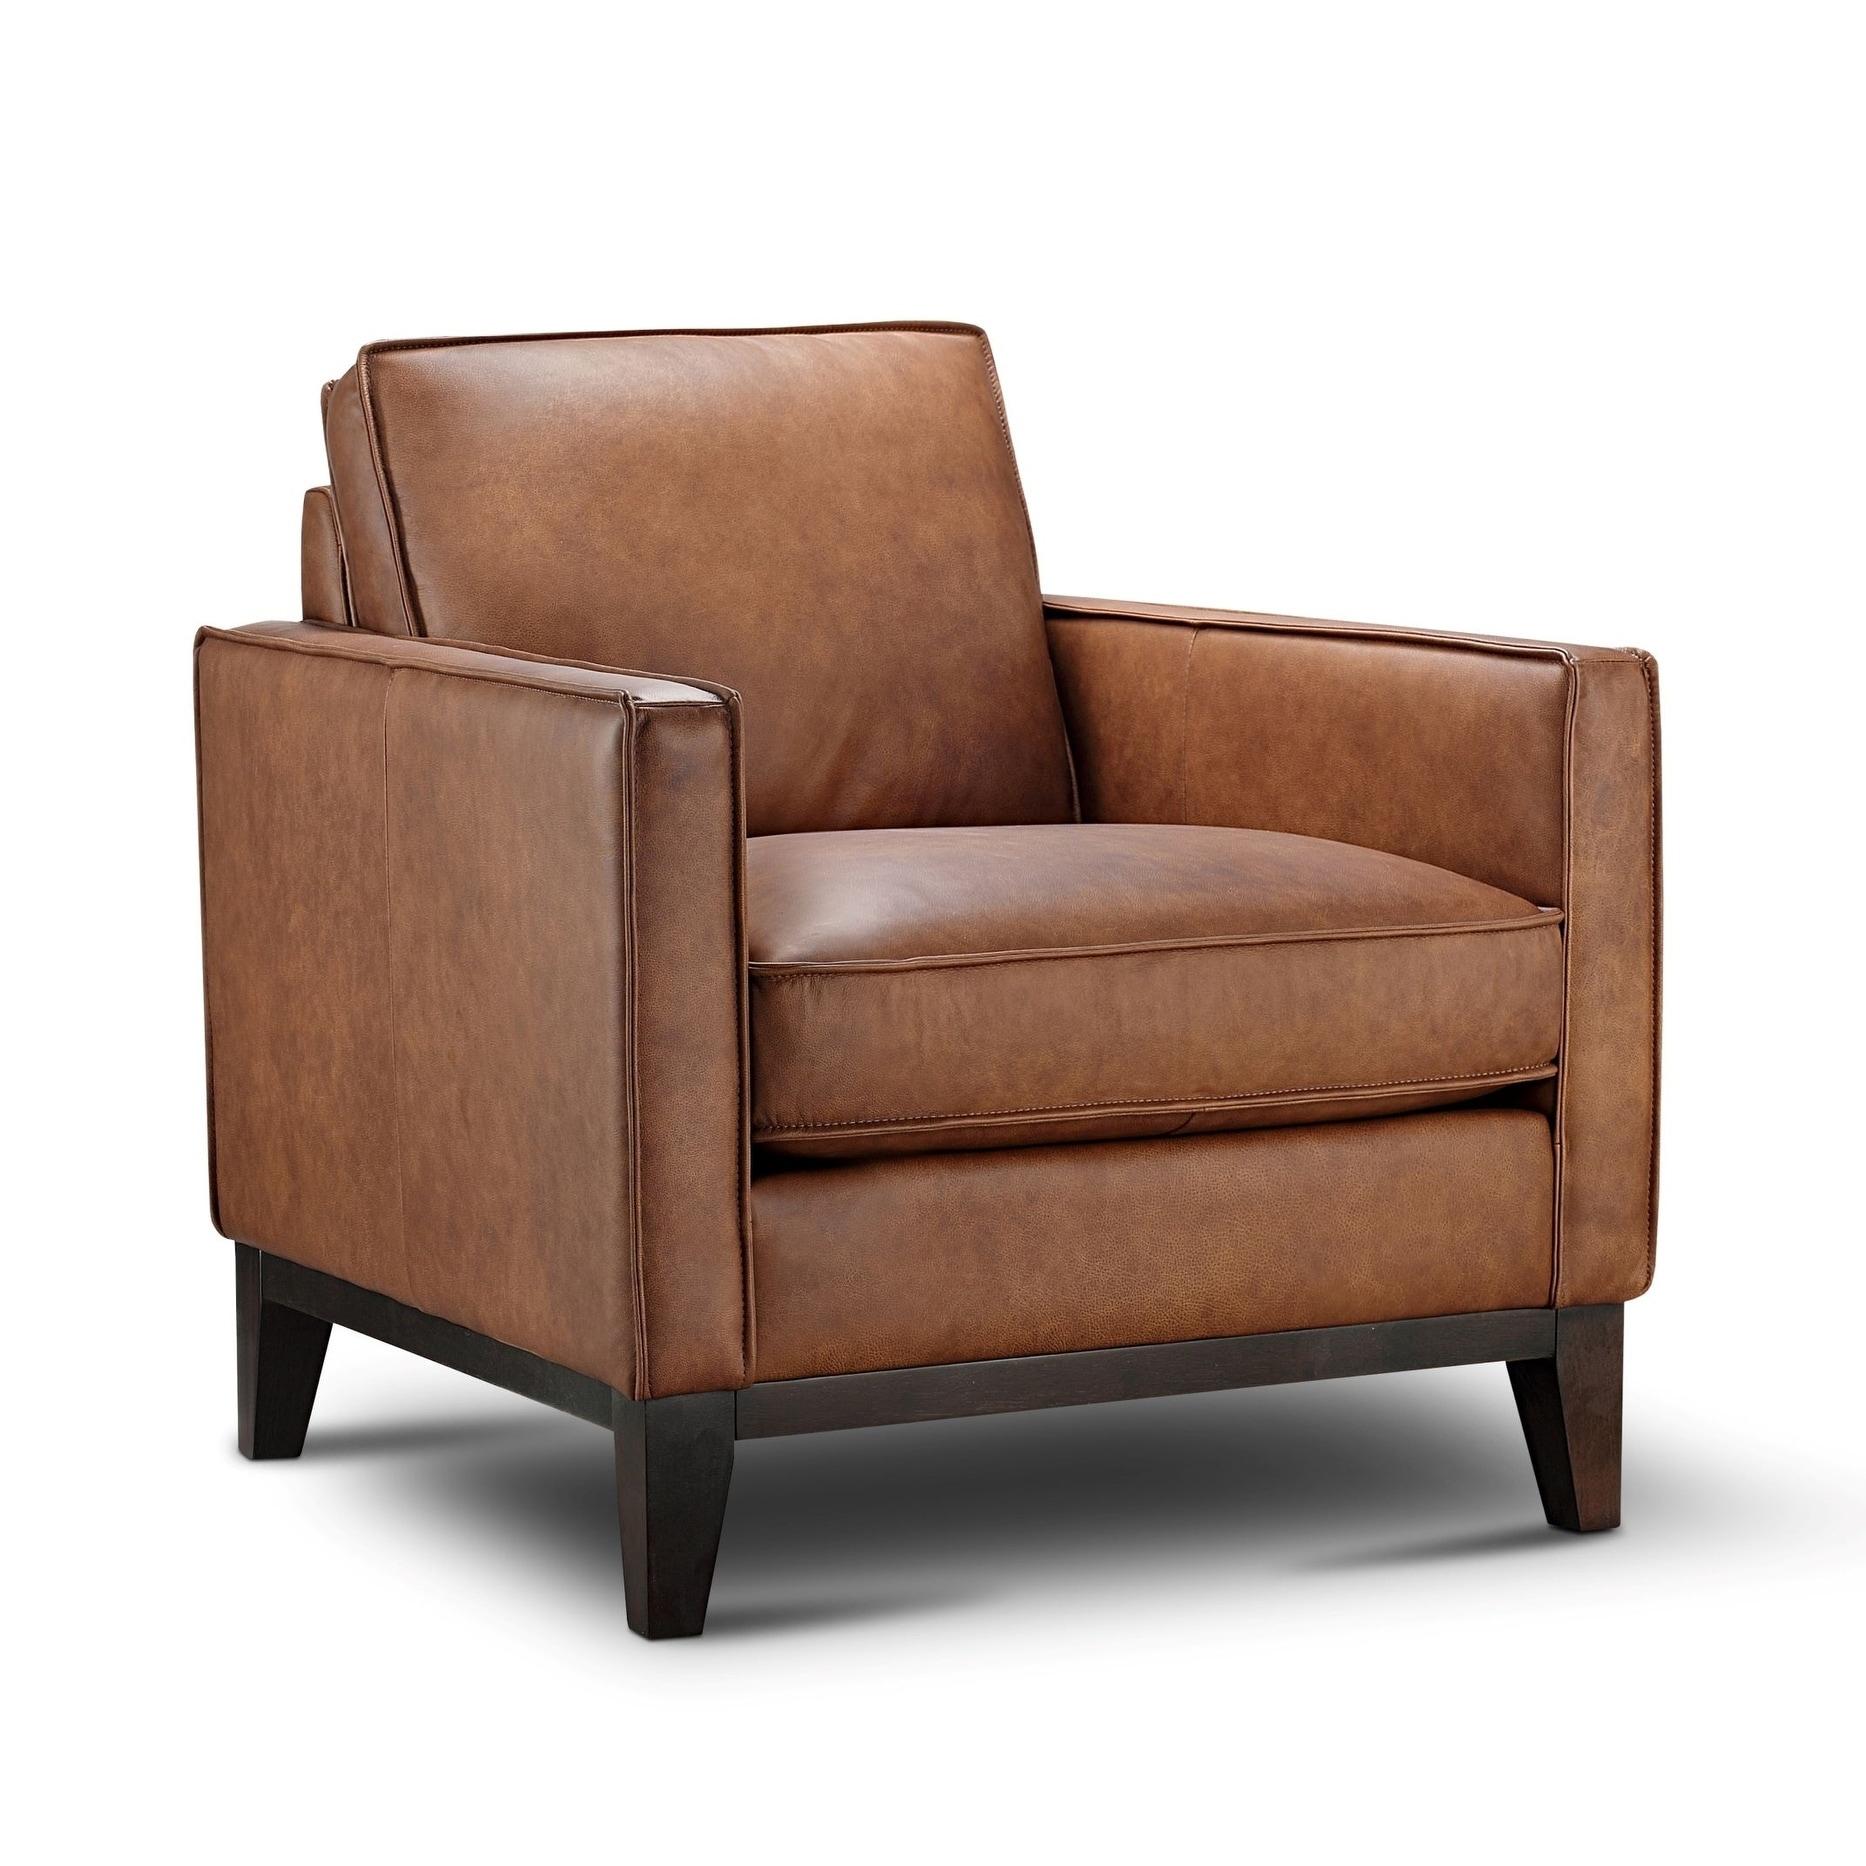 Pimlico Top Grain Leather Armchair Overstock 30972097